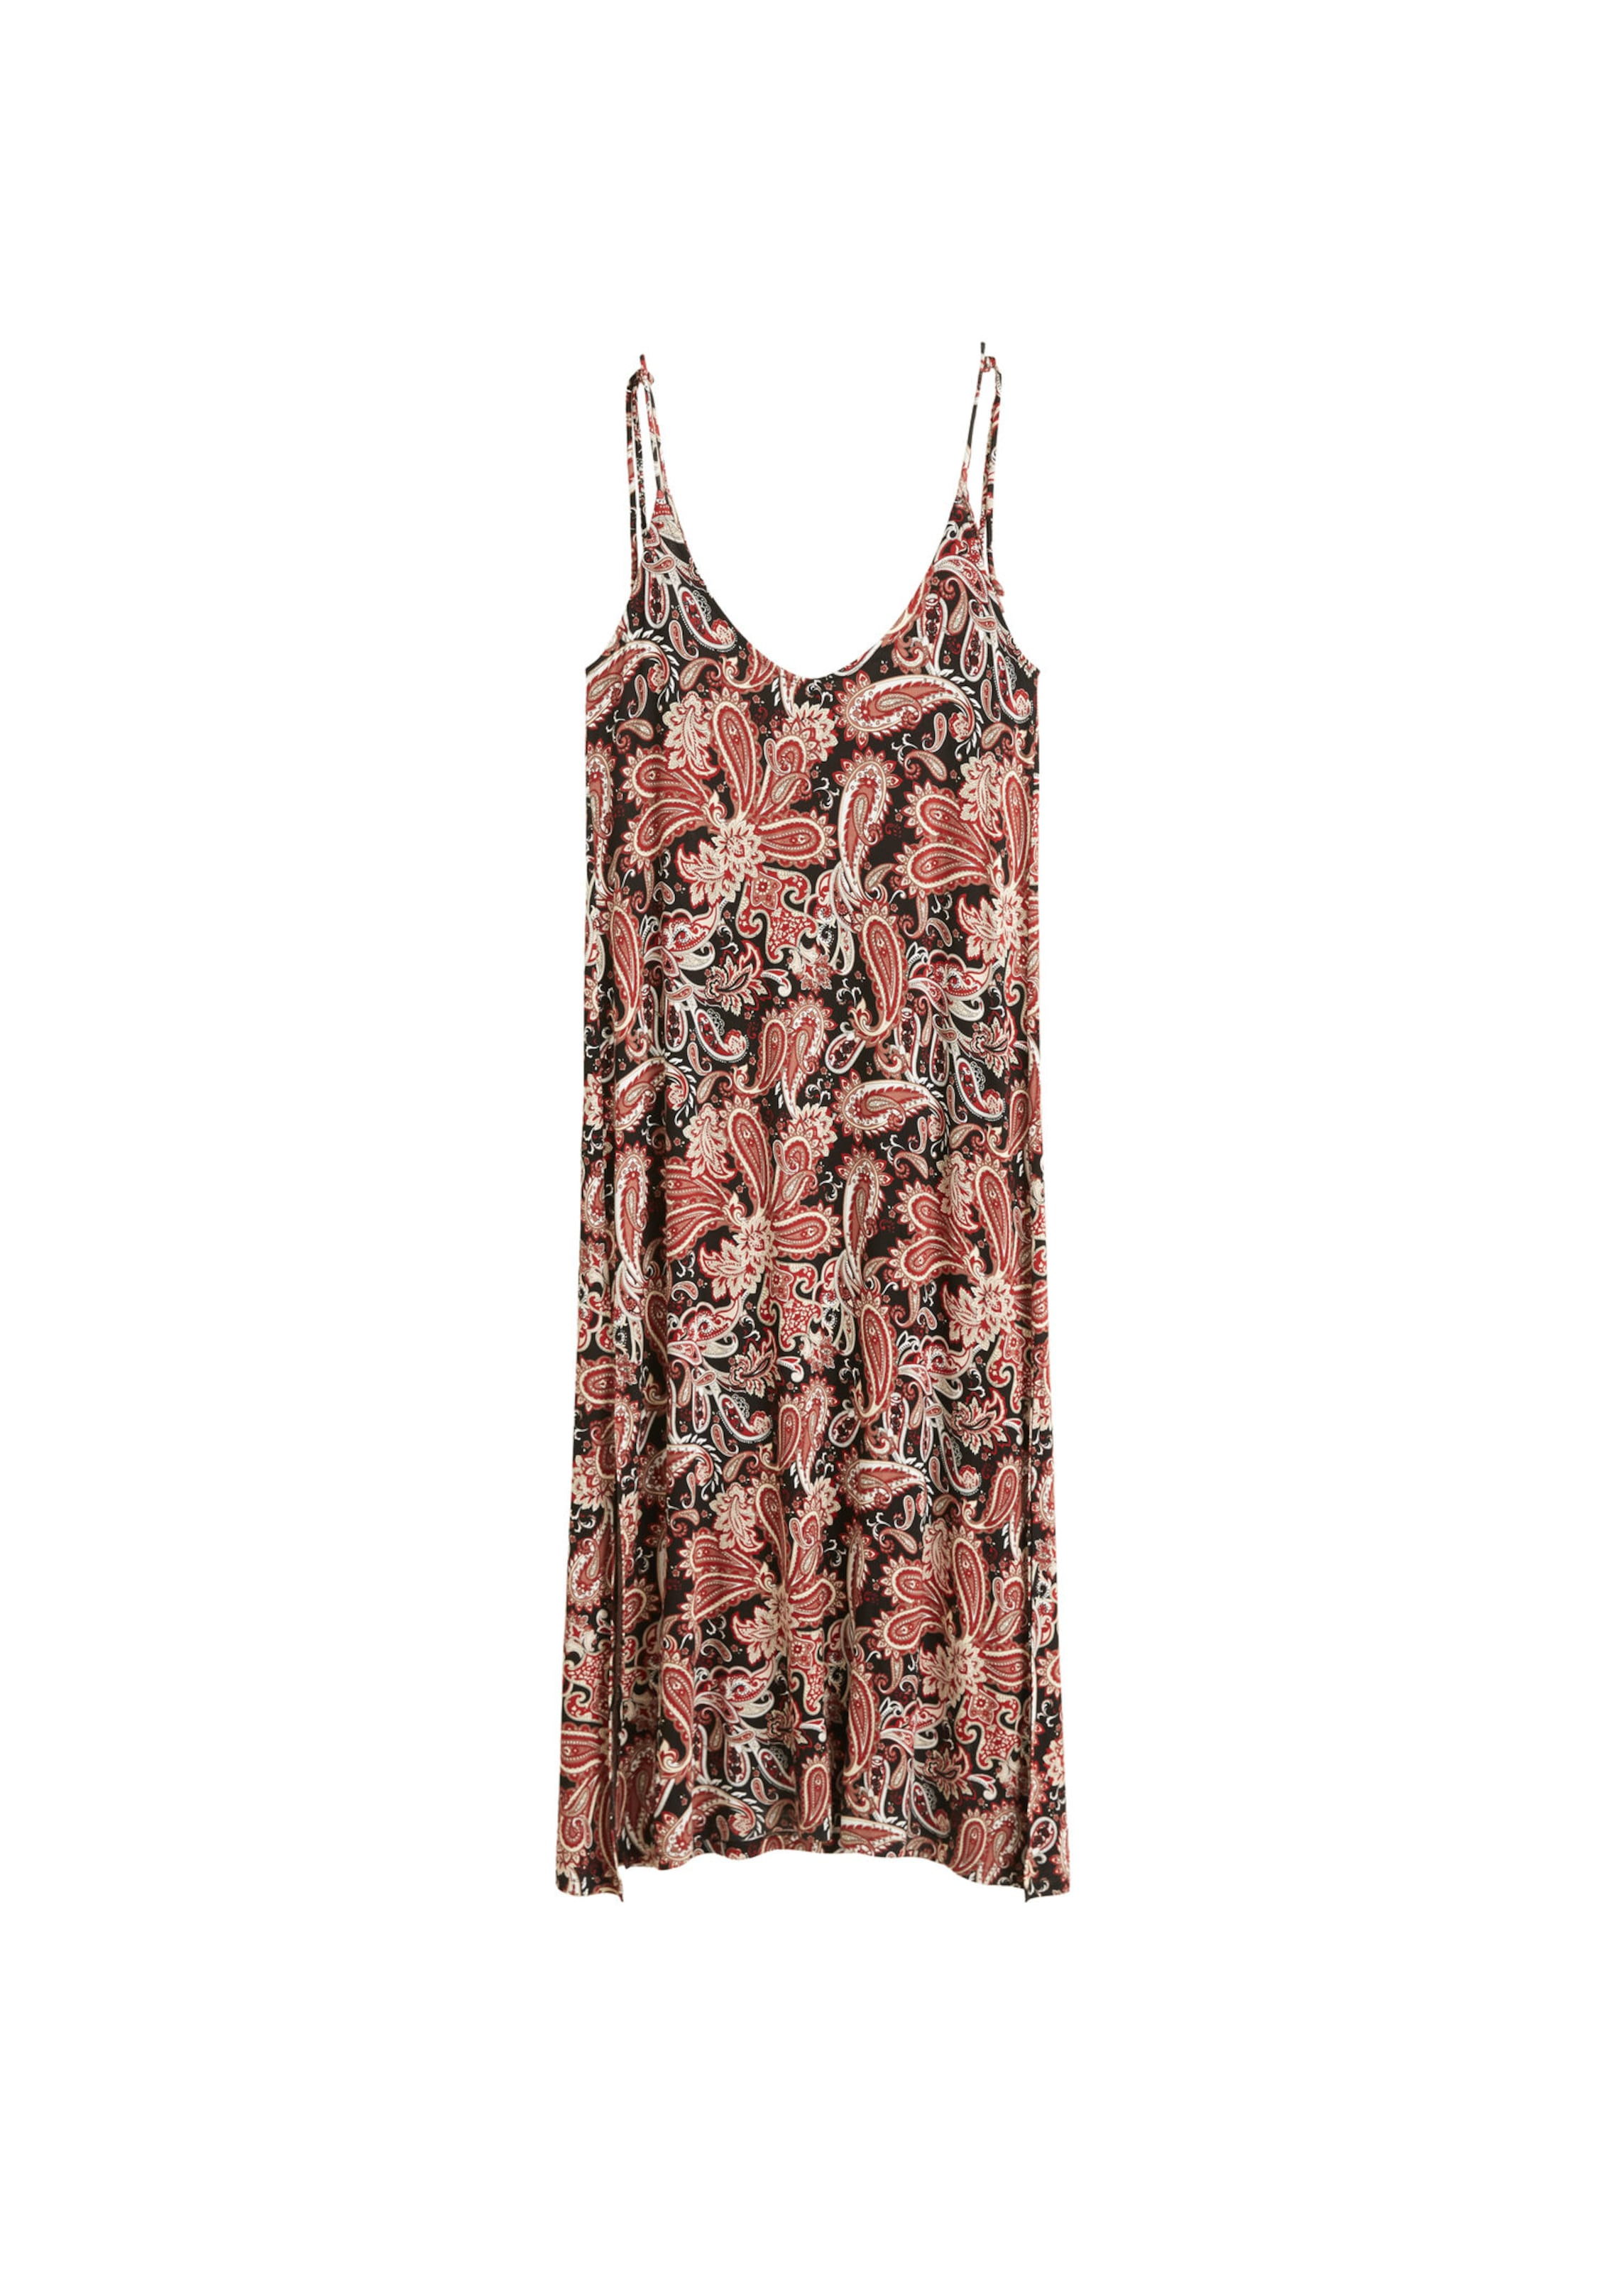 'llestin' BraunRot Mango Mango Kleid Kleid BraunRot Kleid In Mango In 'llestin' tCBdohsrxQ